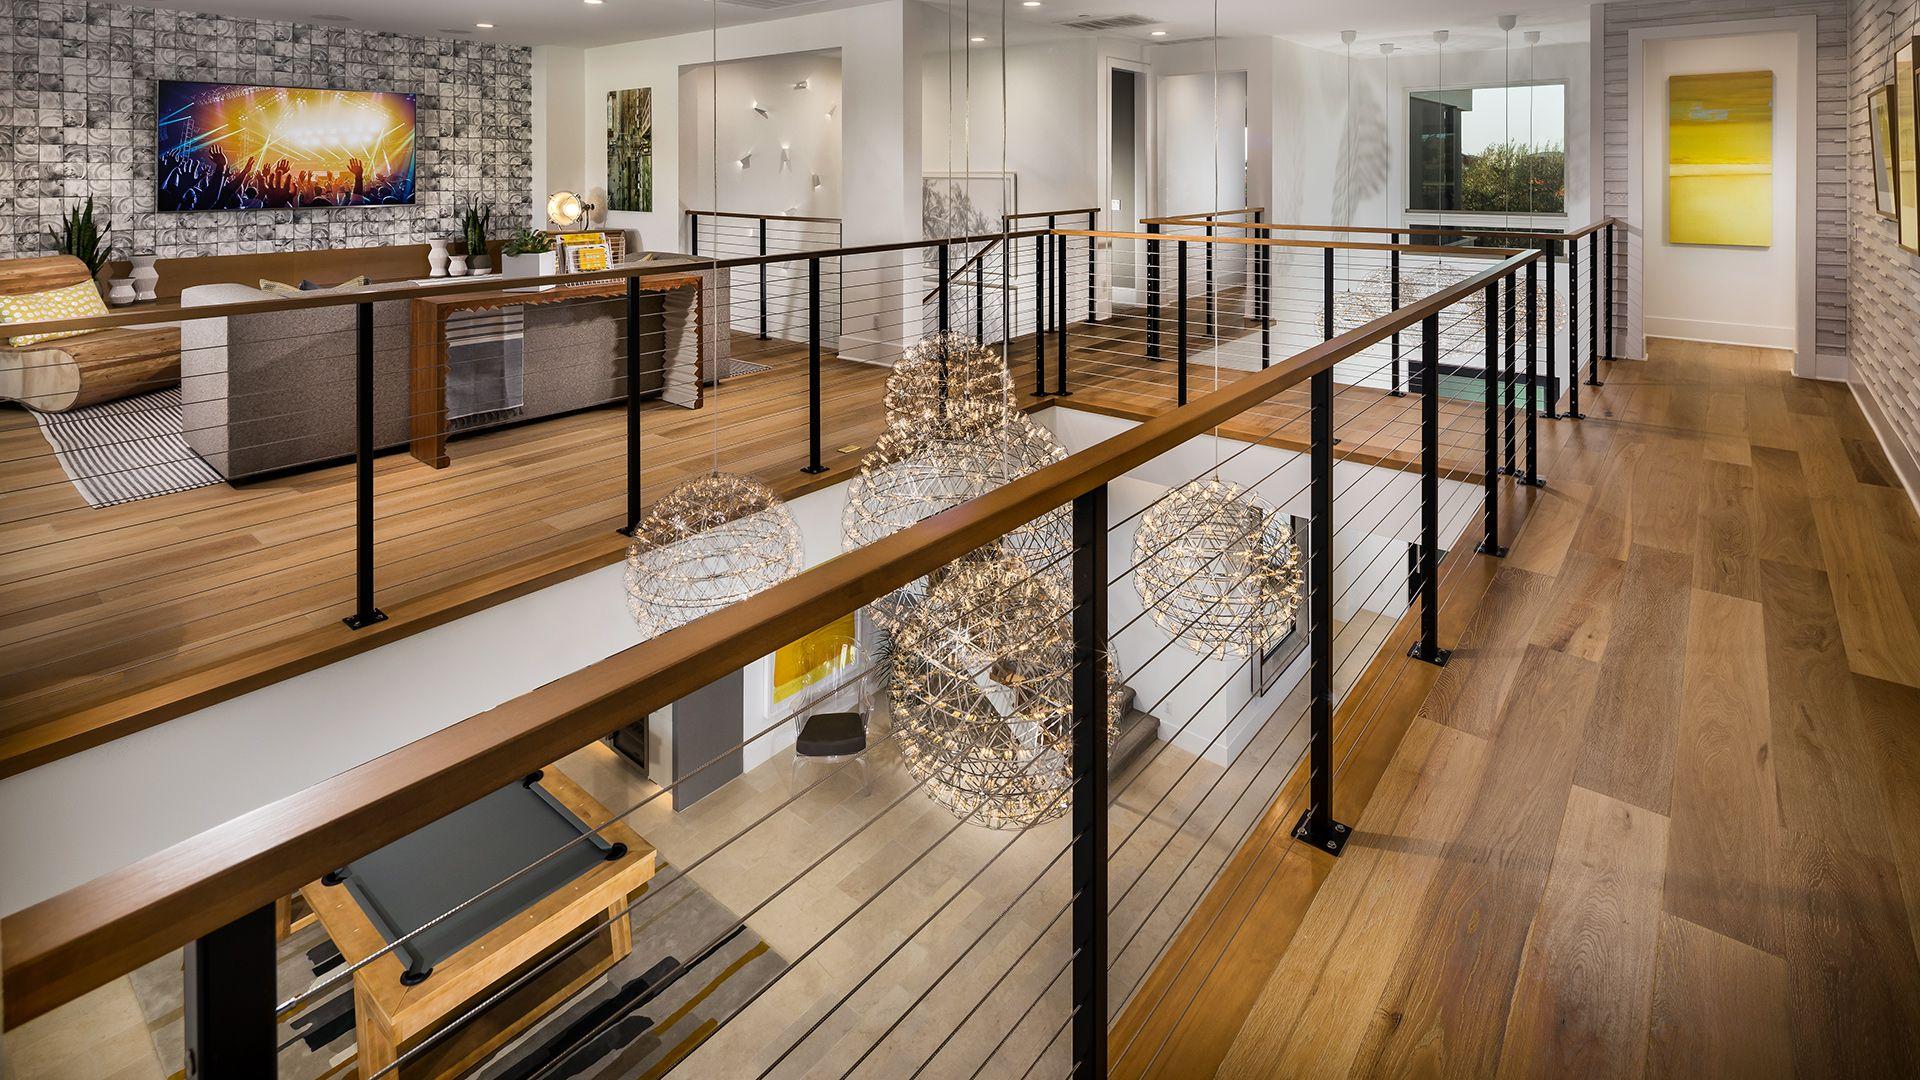 Calypso | Interior design trends, Latest house designs ...